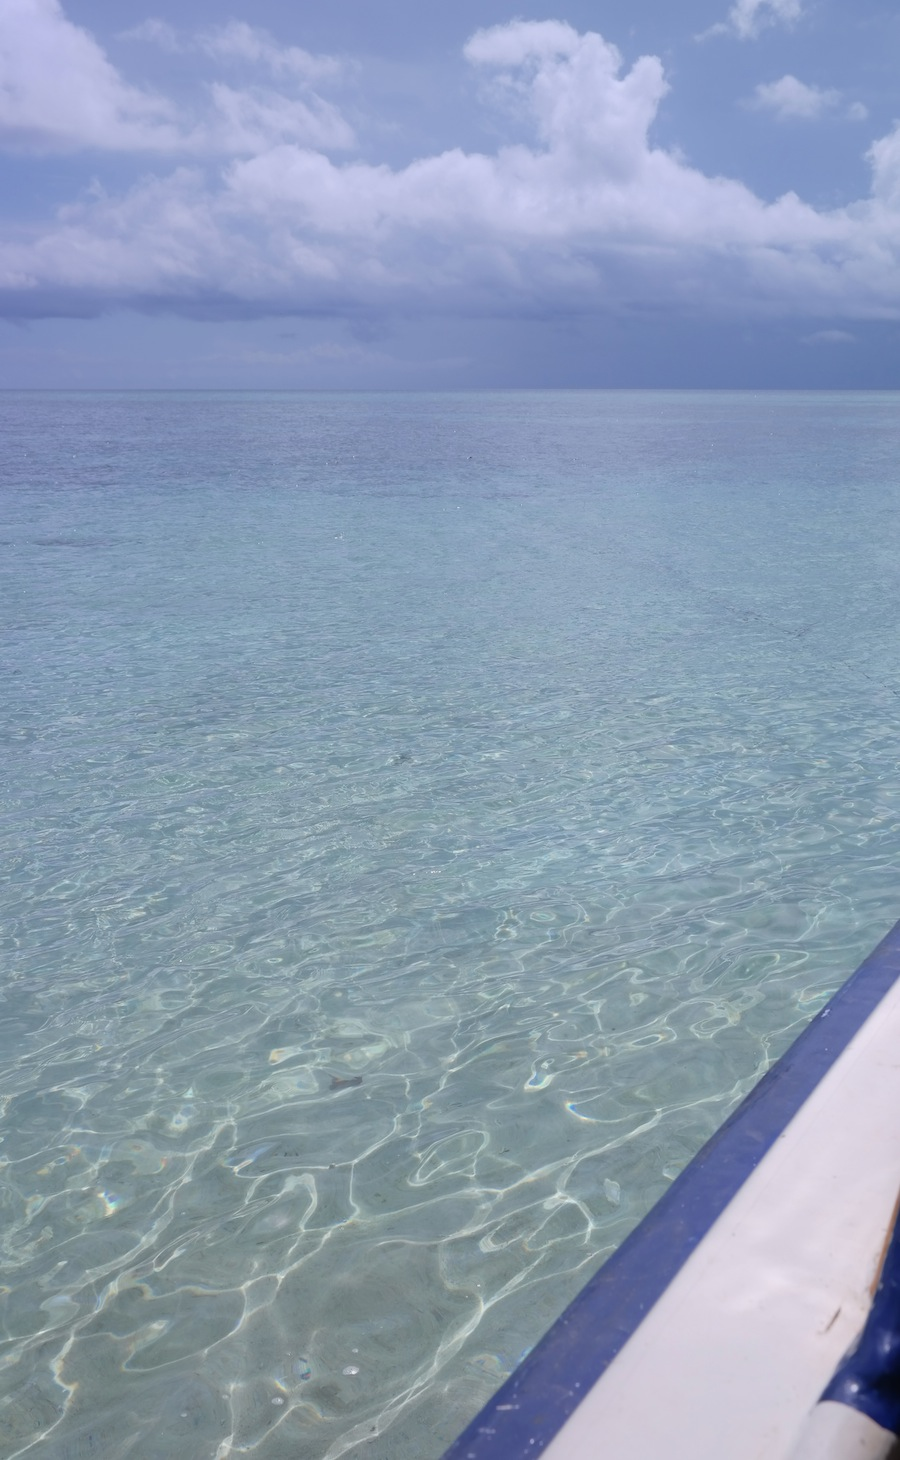 "<a href=""http://mataram.info/things-to-do-in-bali/visitindonesia-banda-marine-life-the-paradise-of-diving-topographic-point-inward-fundamental-maluku/"">Indonesia</a>best destinations : Melihat Penyu Bertelur Di Pulau Sangalaki"